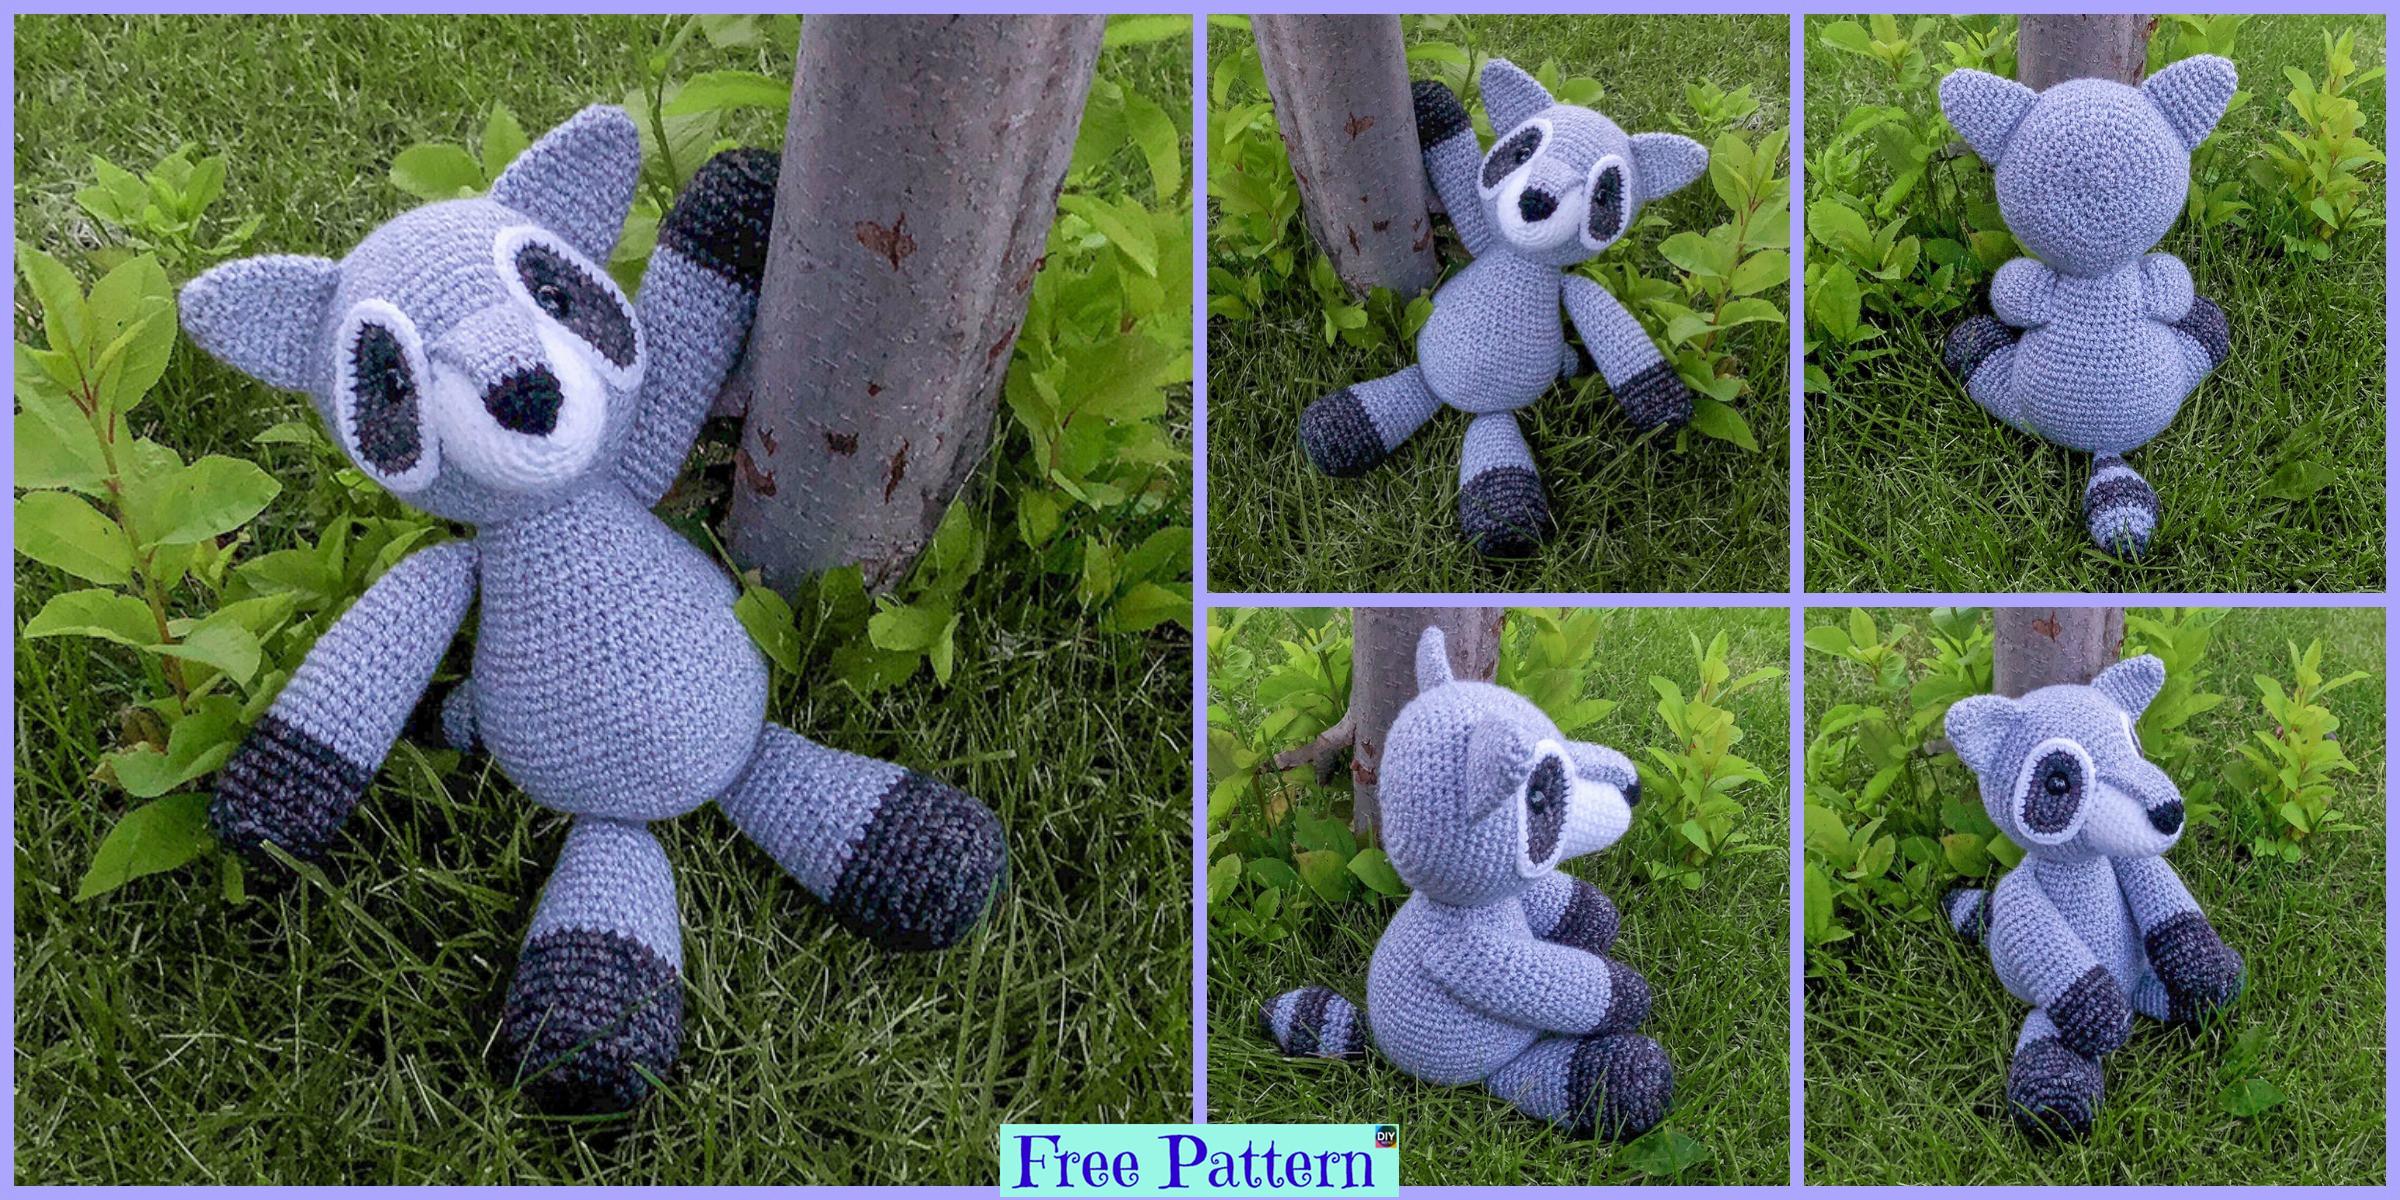 Crochet Raccoon Amigurumi – Free Pattern